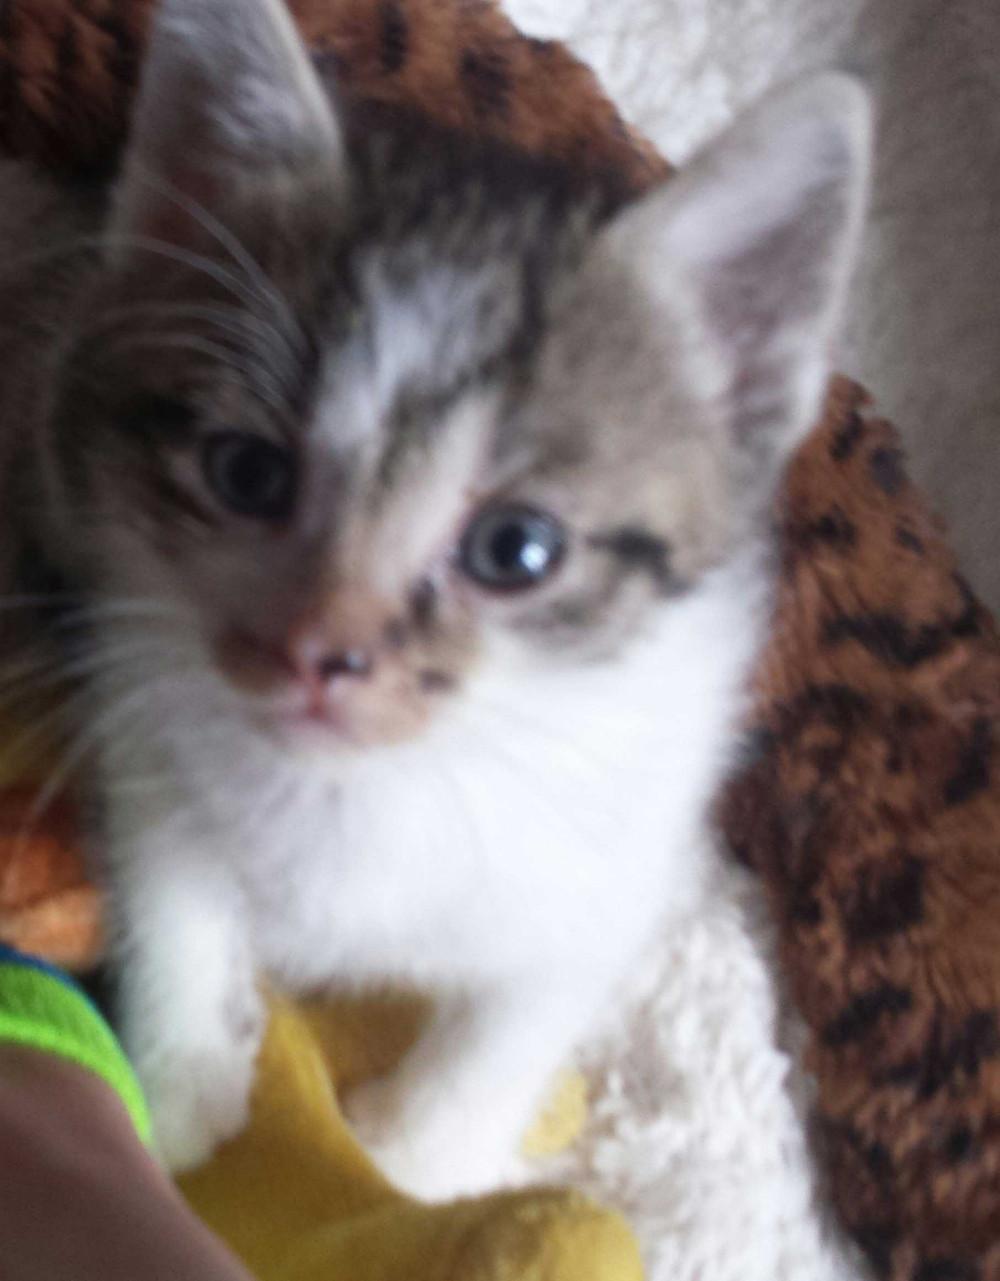 Katzenbabys abzugeben! - 852114